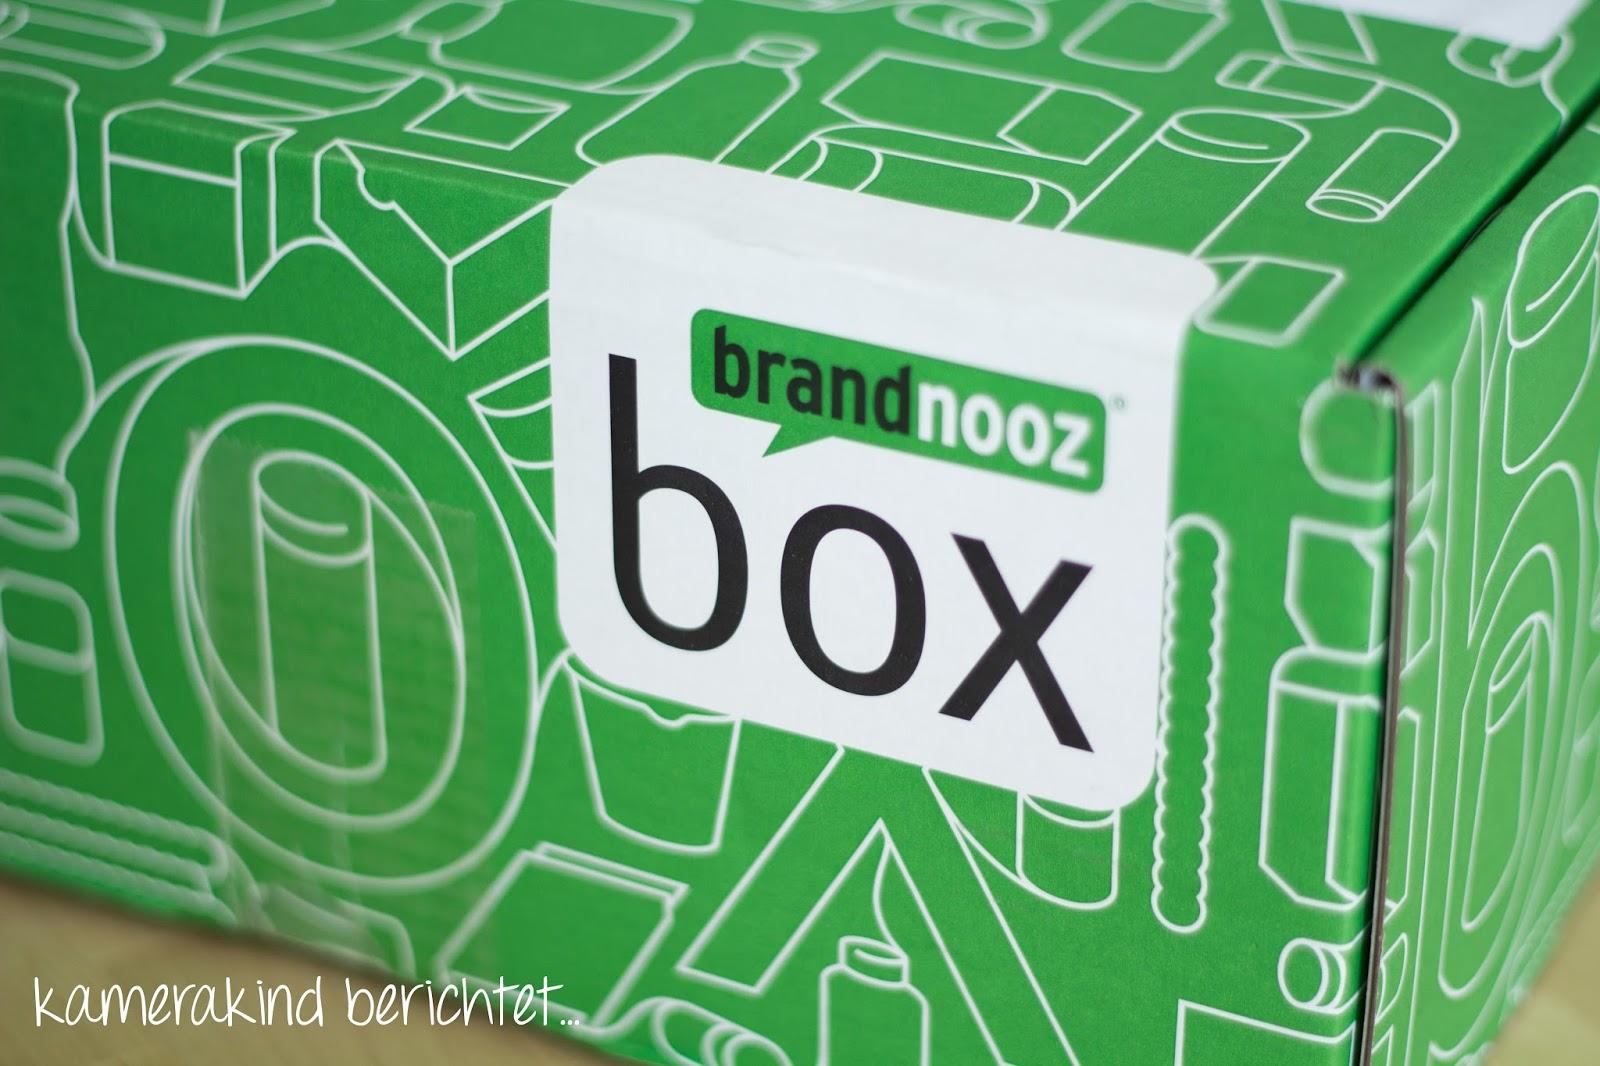 Unboxing Brandnooz 2014